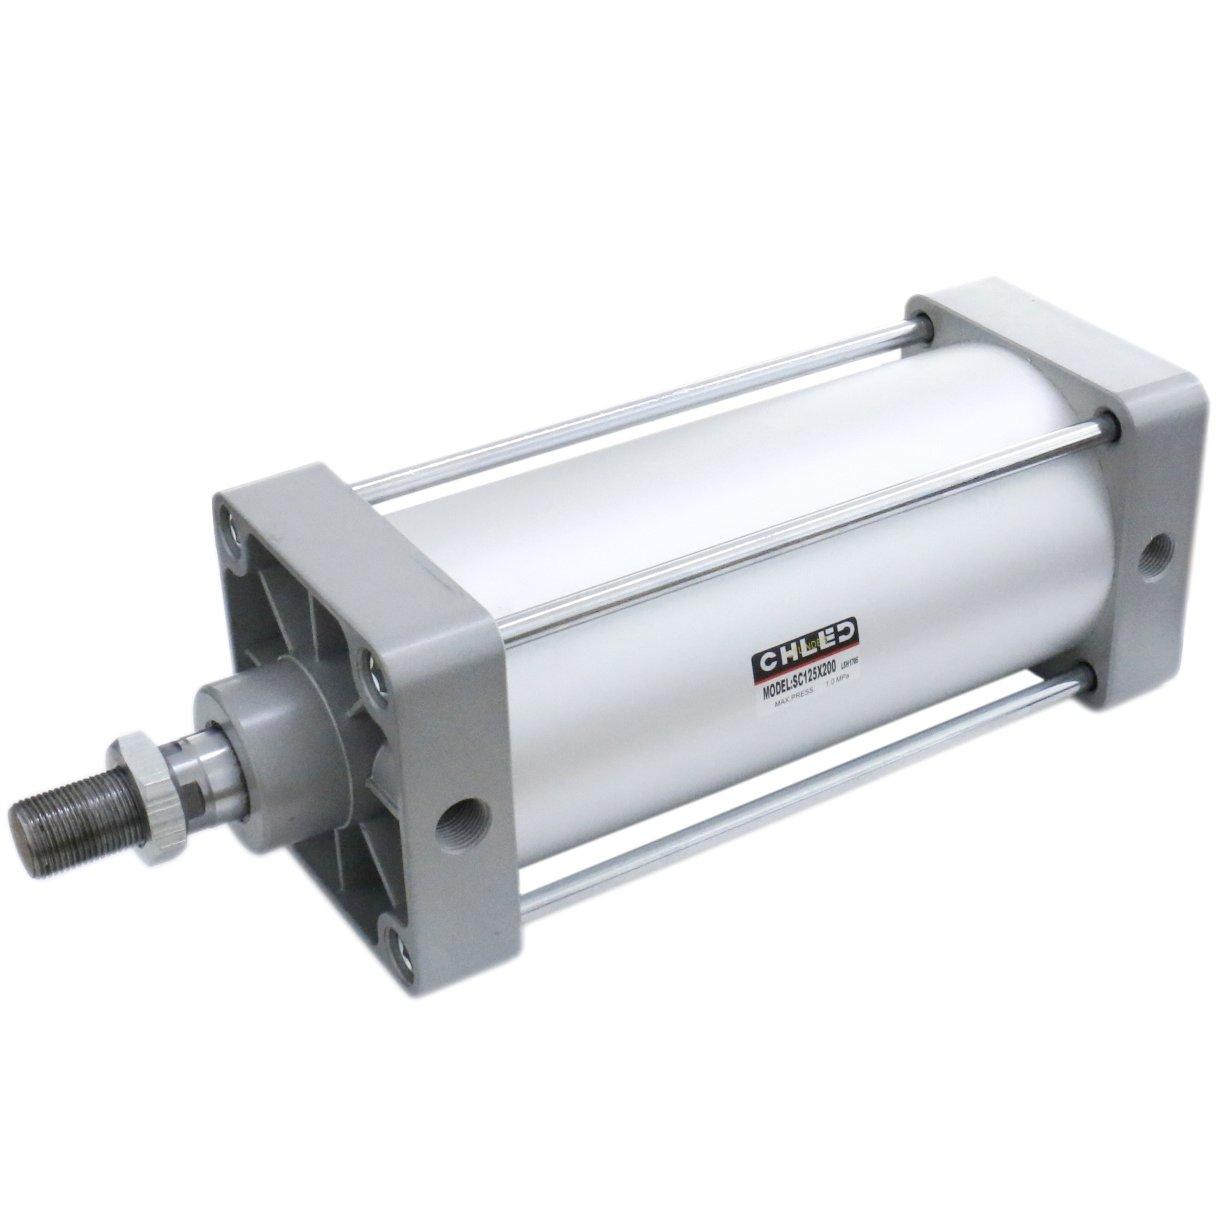 Baomain Pneumatic Air Cylinder SC 125 x 200 PT 1/2; Bore: 5'', Stroke: 8''; Screwed Piston Rod Dual Action